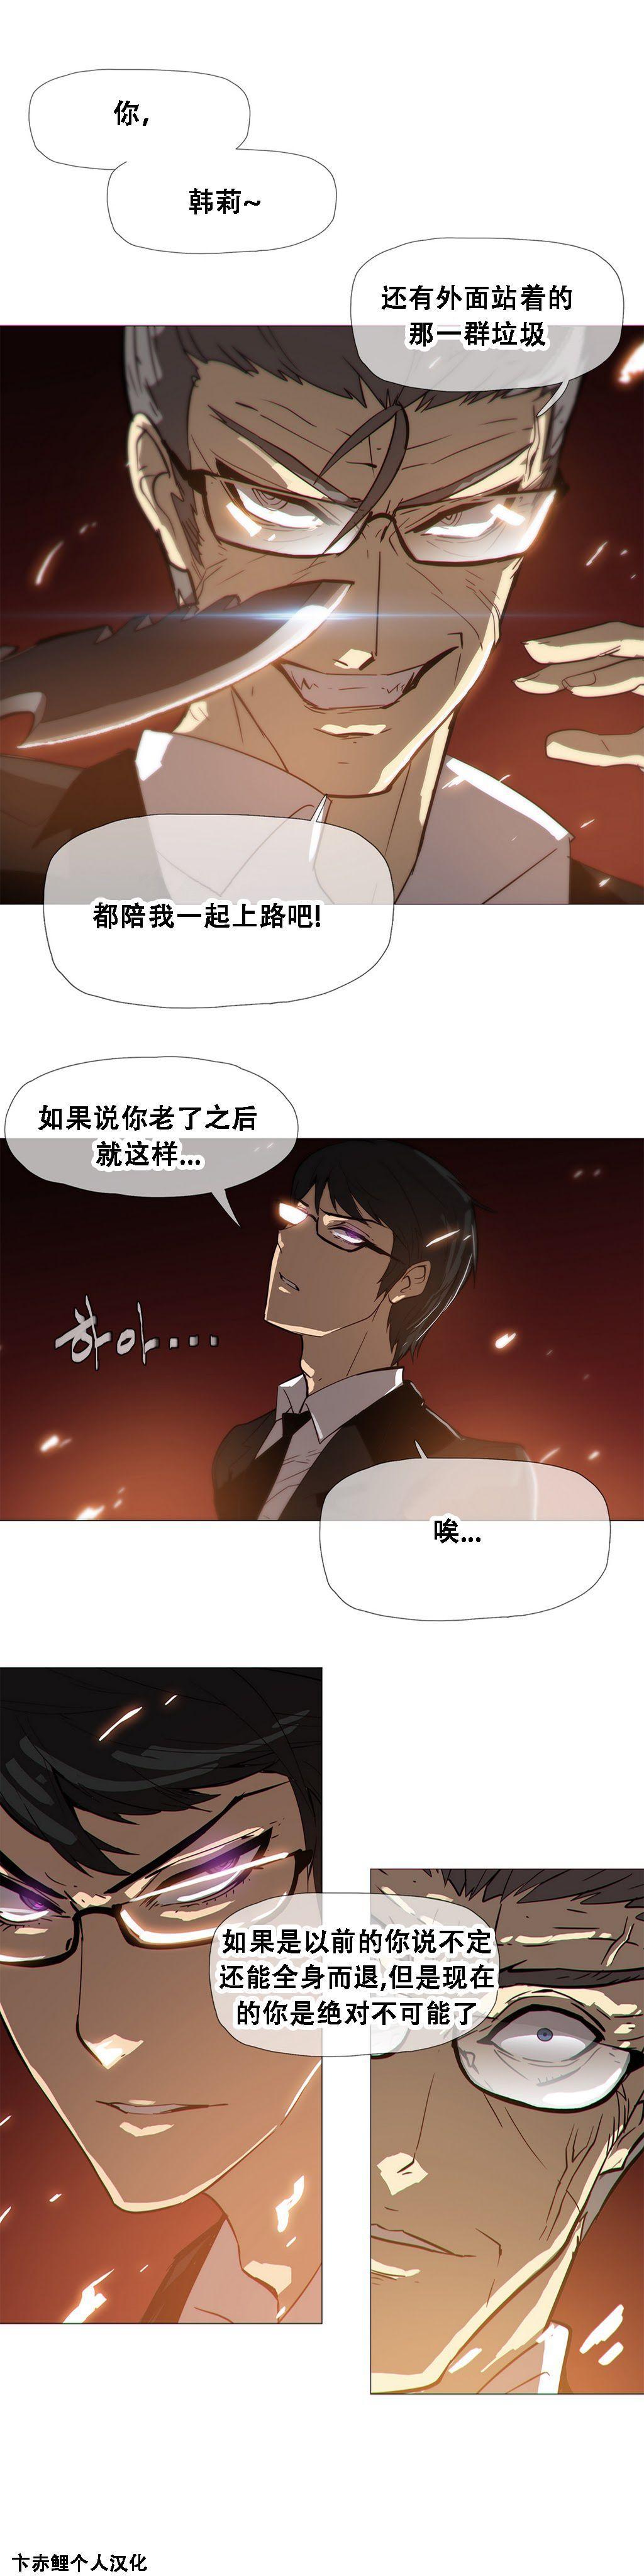 HouseHold Affairs 【卞赤鲤个人汉化】1~33话(持续更新中) 382